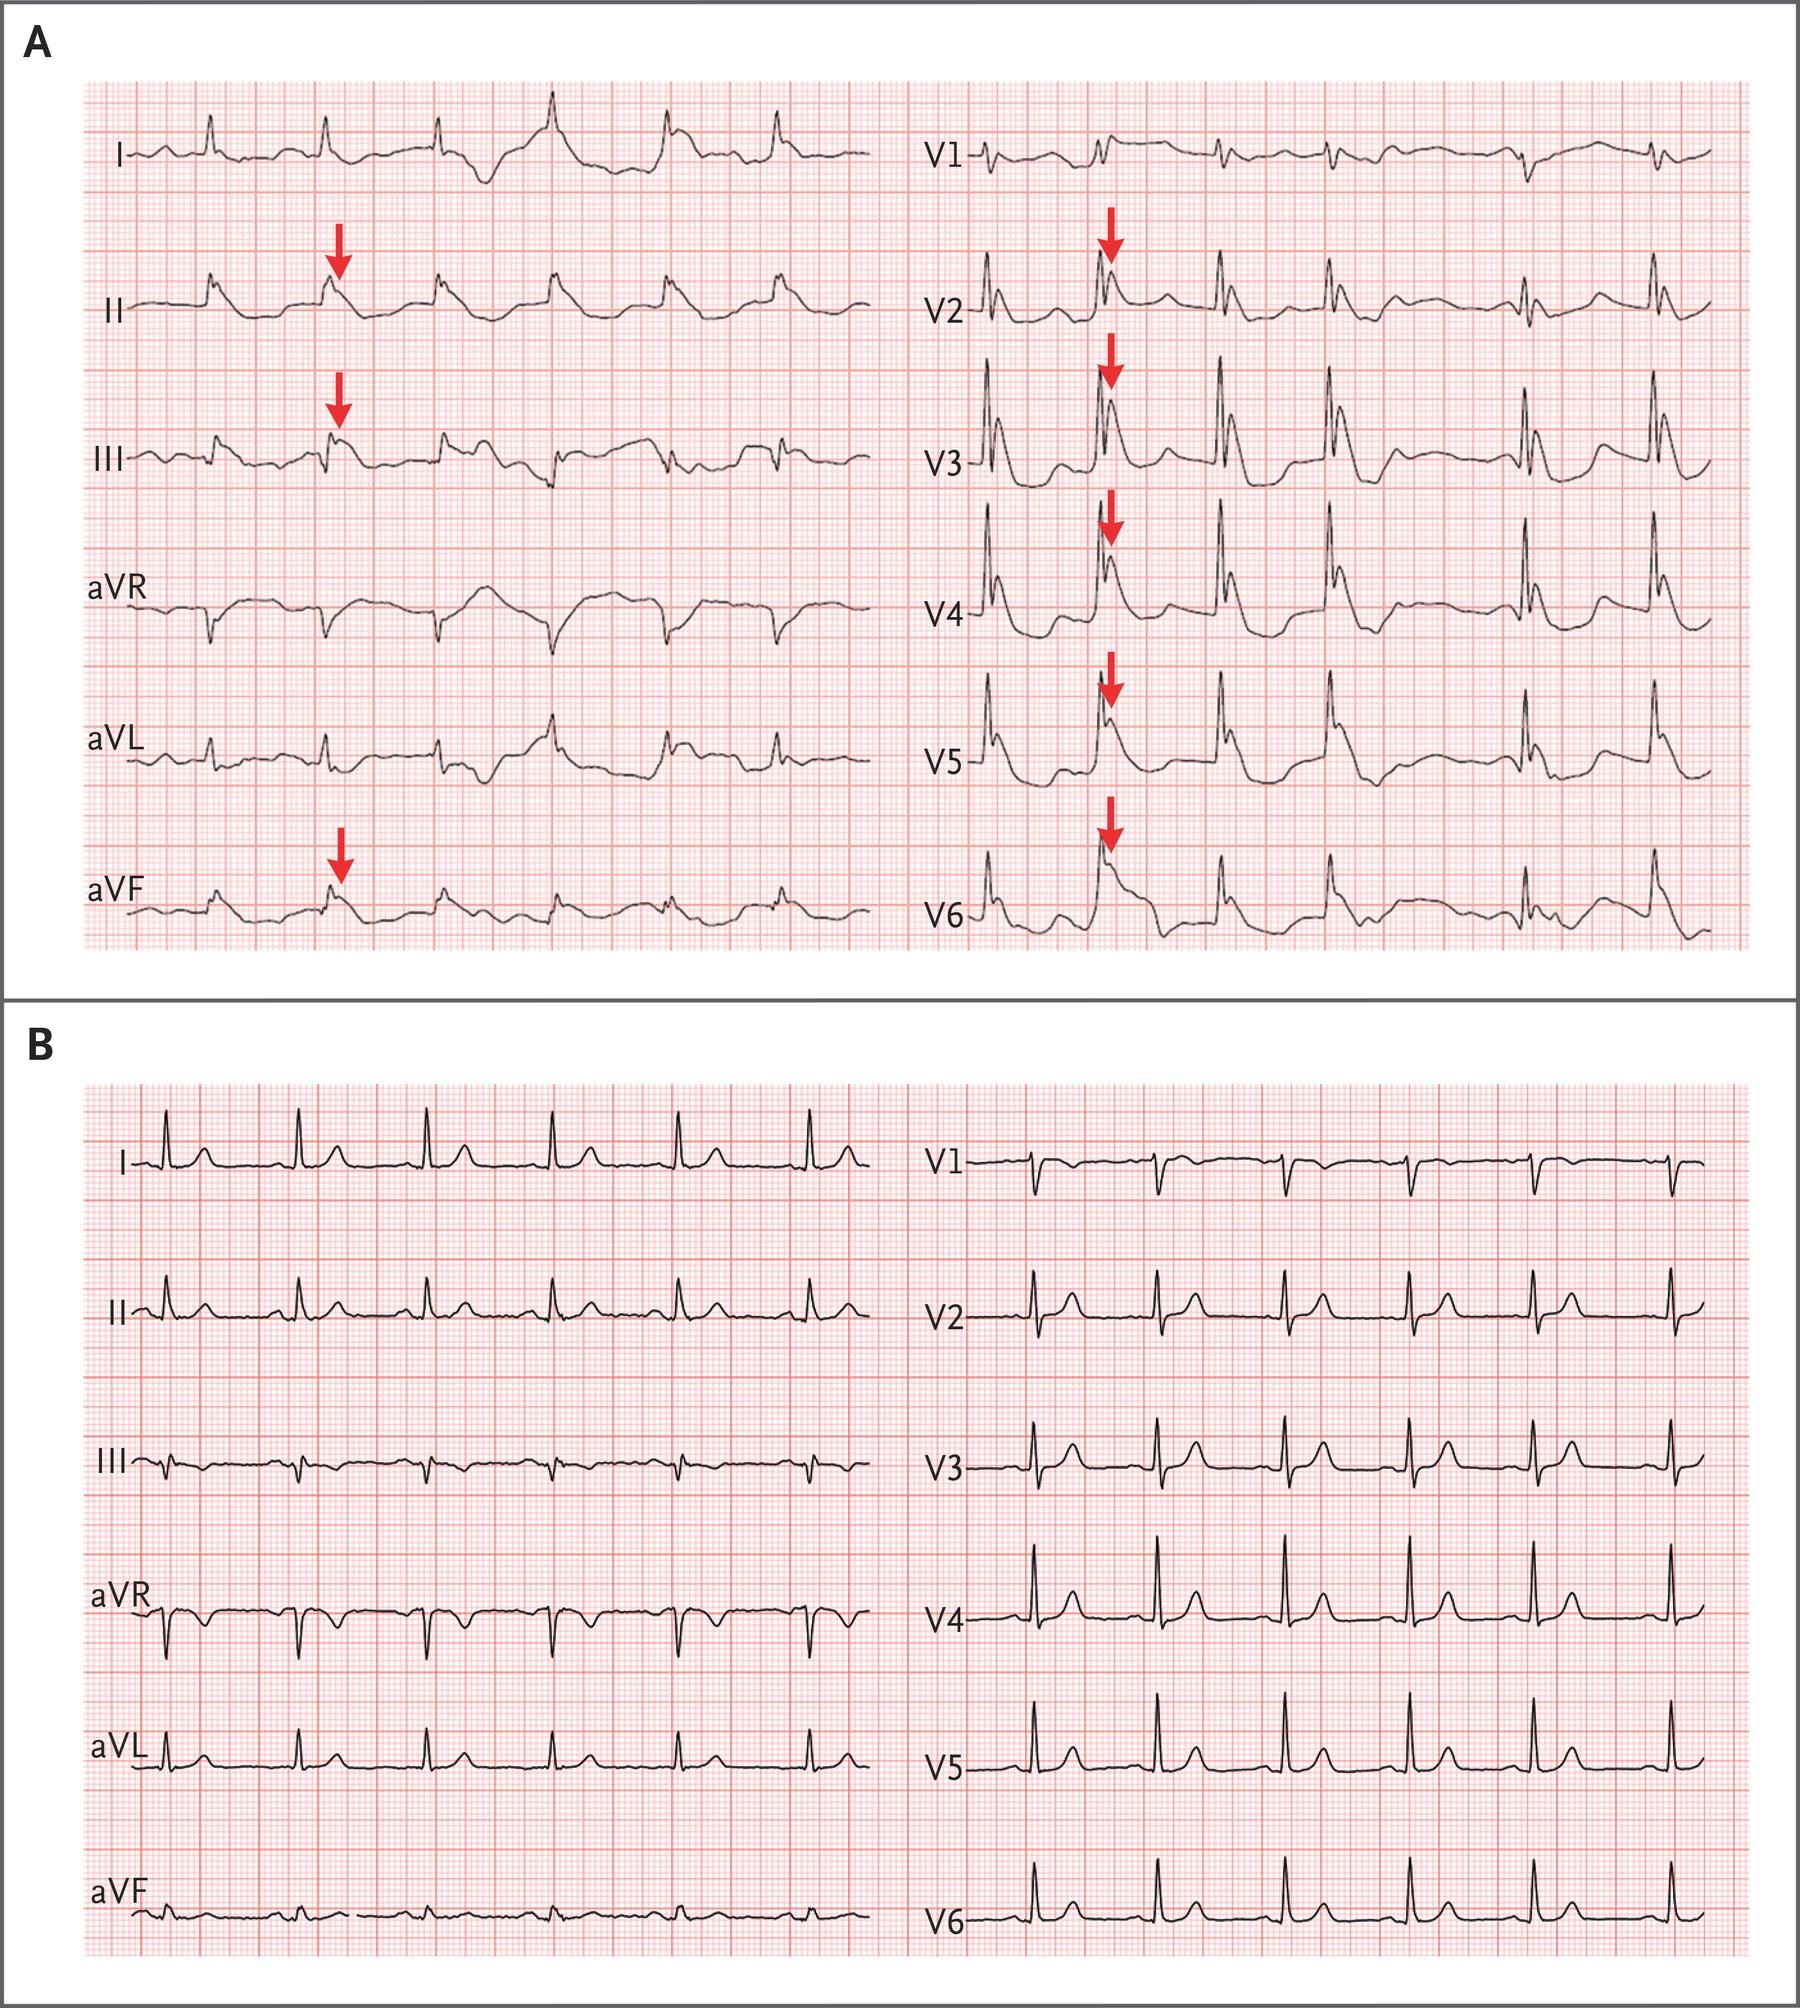 [NEJM临床医学影像]:低温时的心电图改变